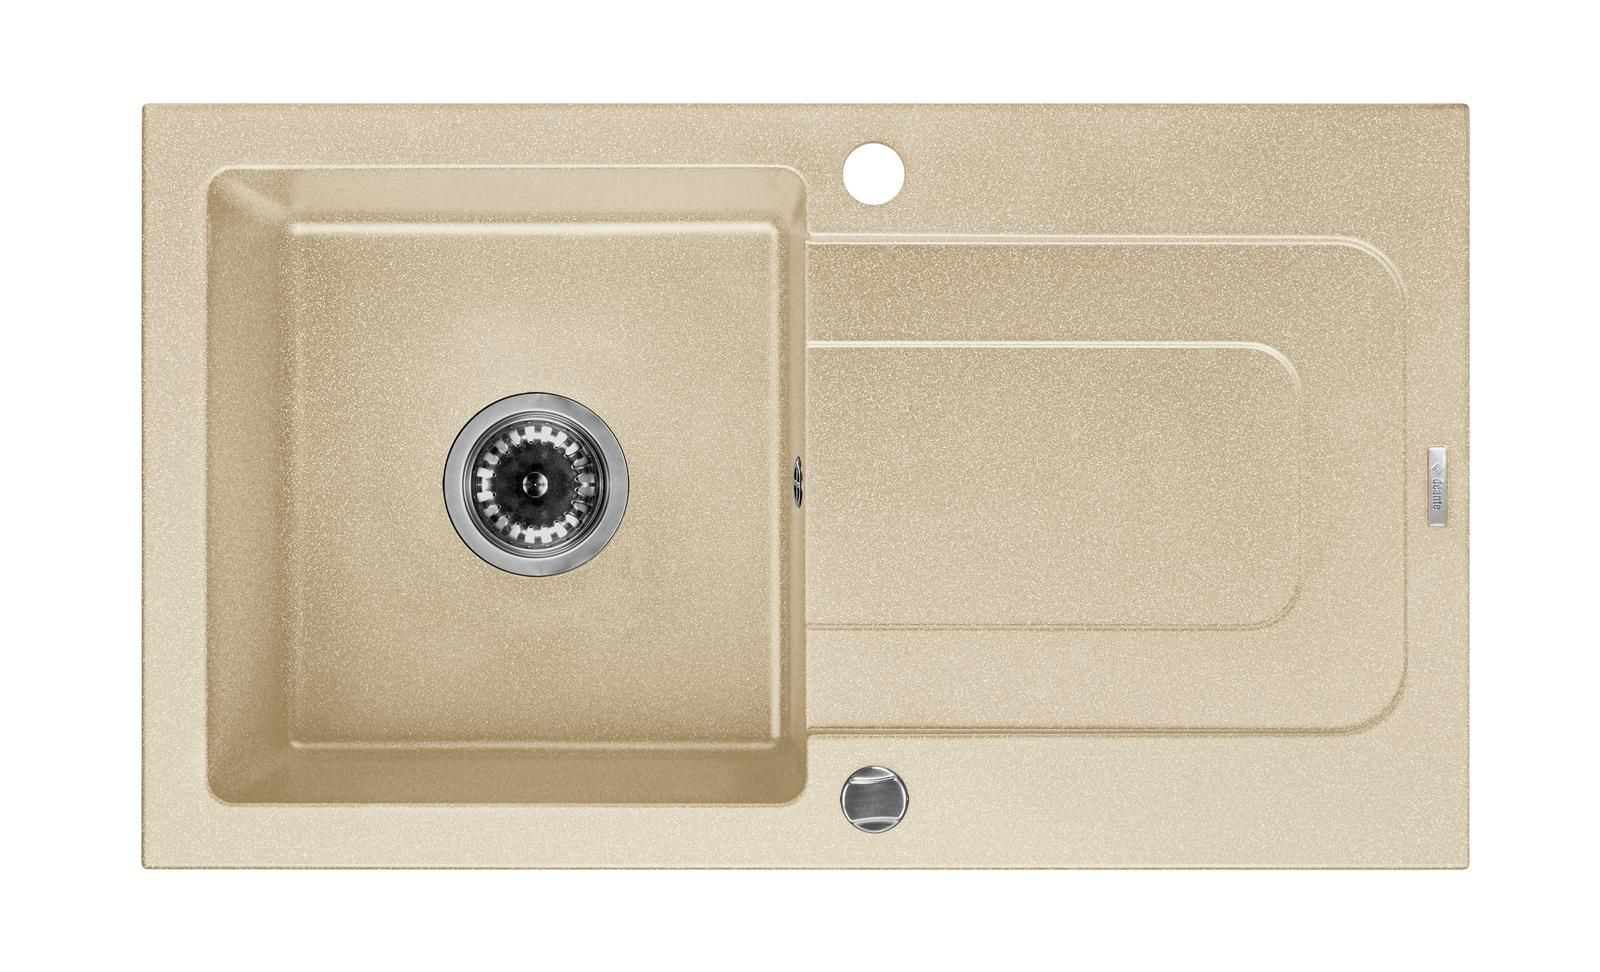 DE-Funk | Composite kitchen sinks and Granite kitchen sinks